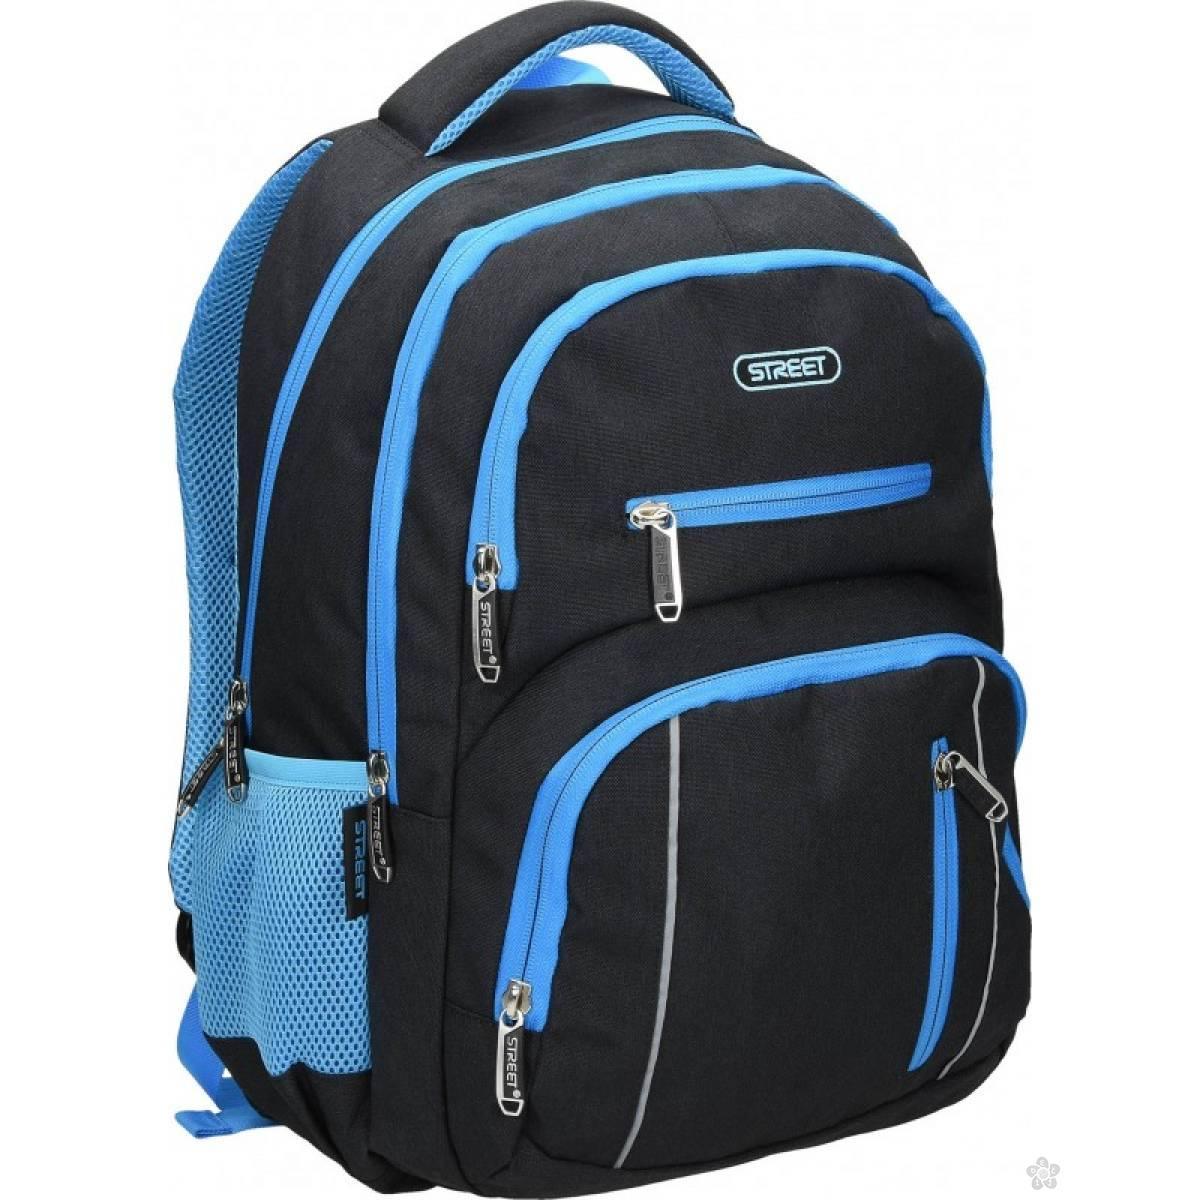 Ranac Street Colour Blue 530218